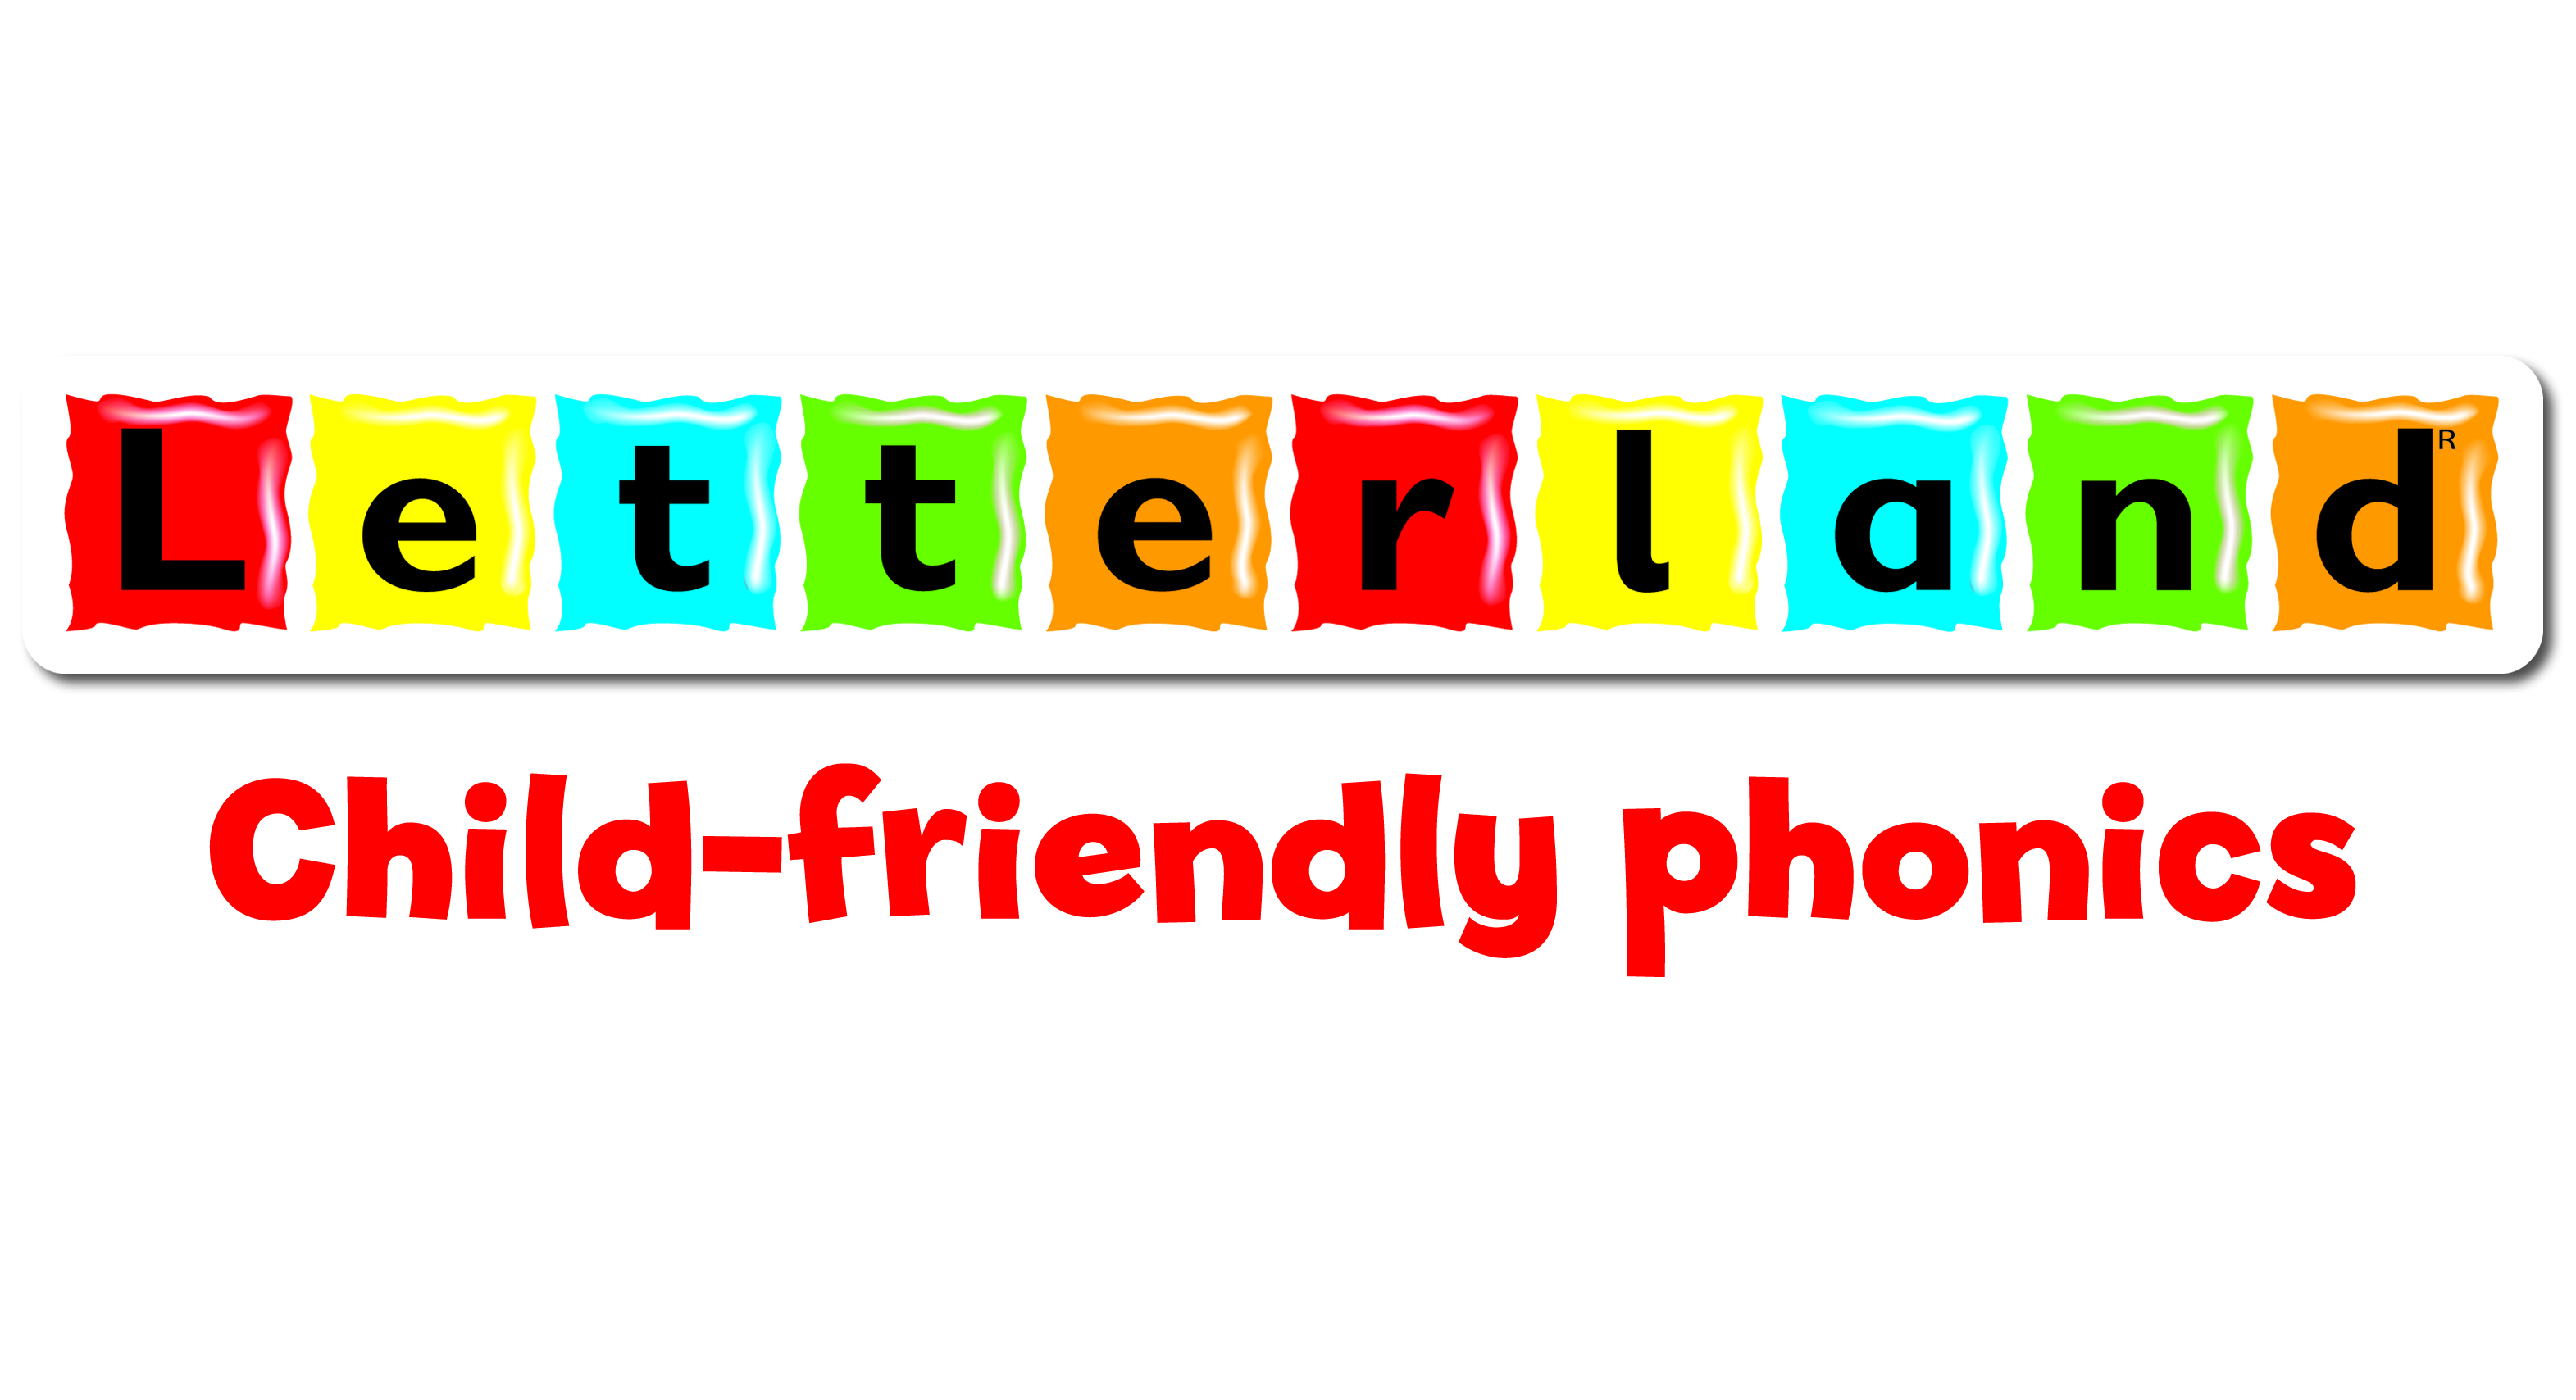 letterland bounce sales marketing ltd